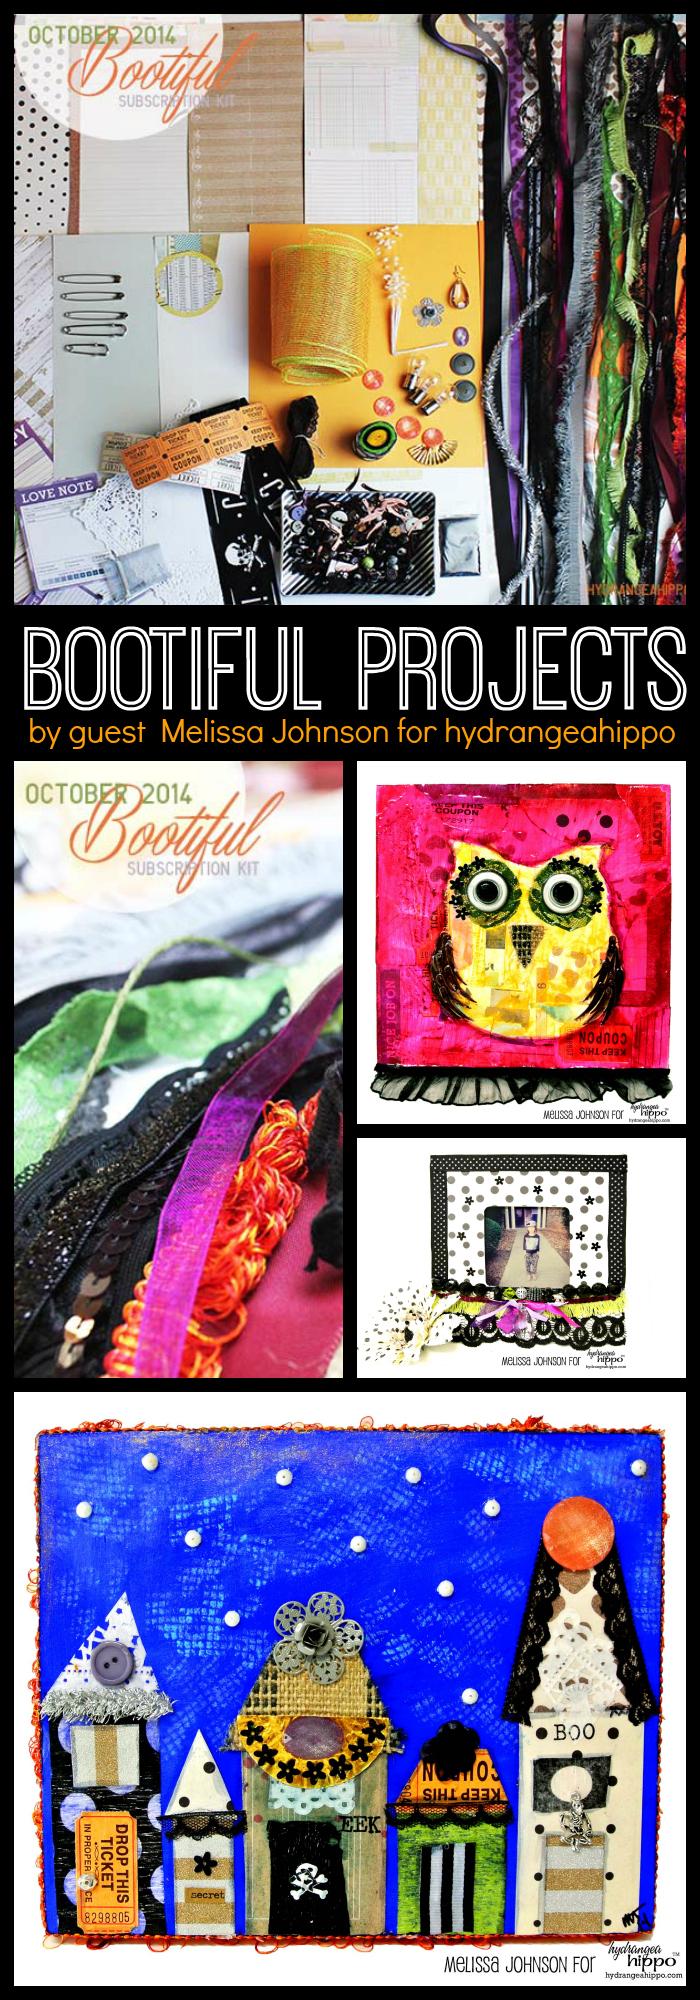 Oct 2014 Bootiful Kit - Guest Designer Melissa Johnson for Jennifer Priest